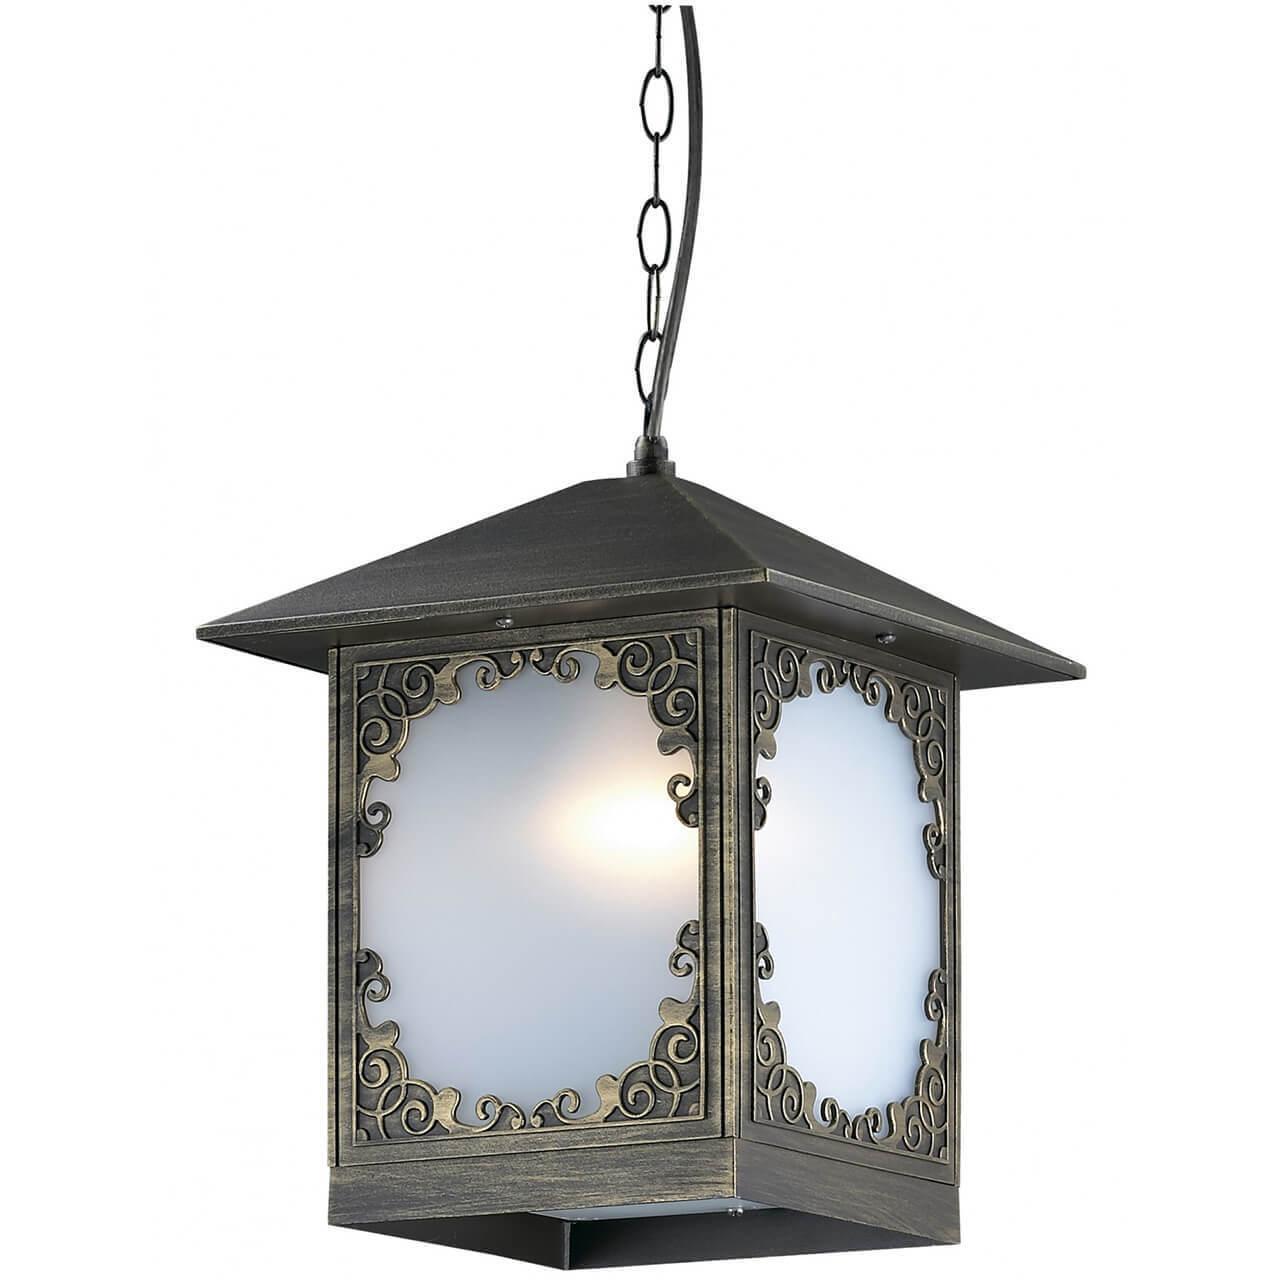 Уличный светильник Odeon Light 2747/1, E27 цена